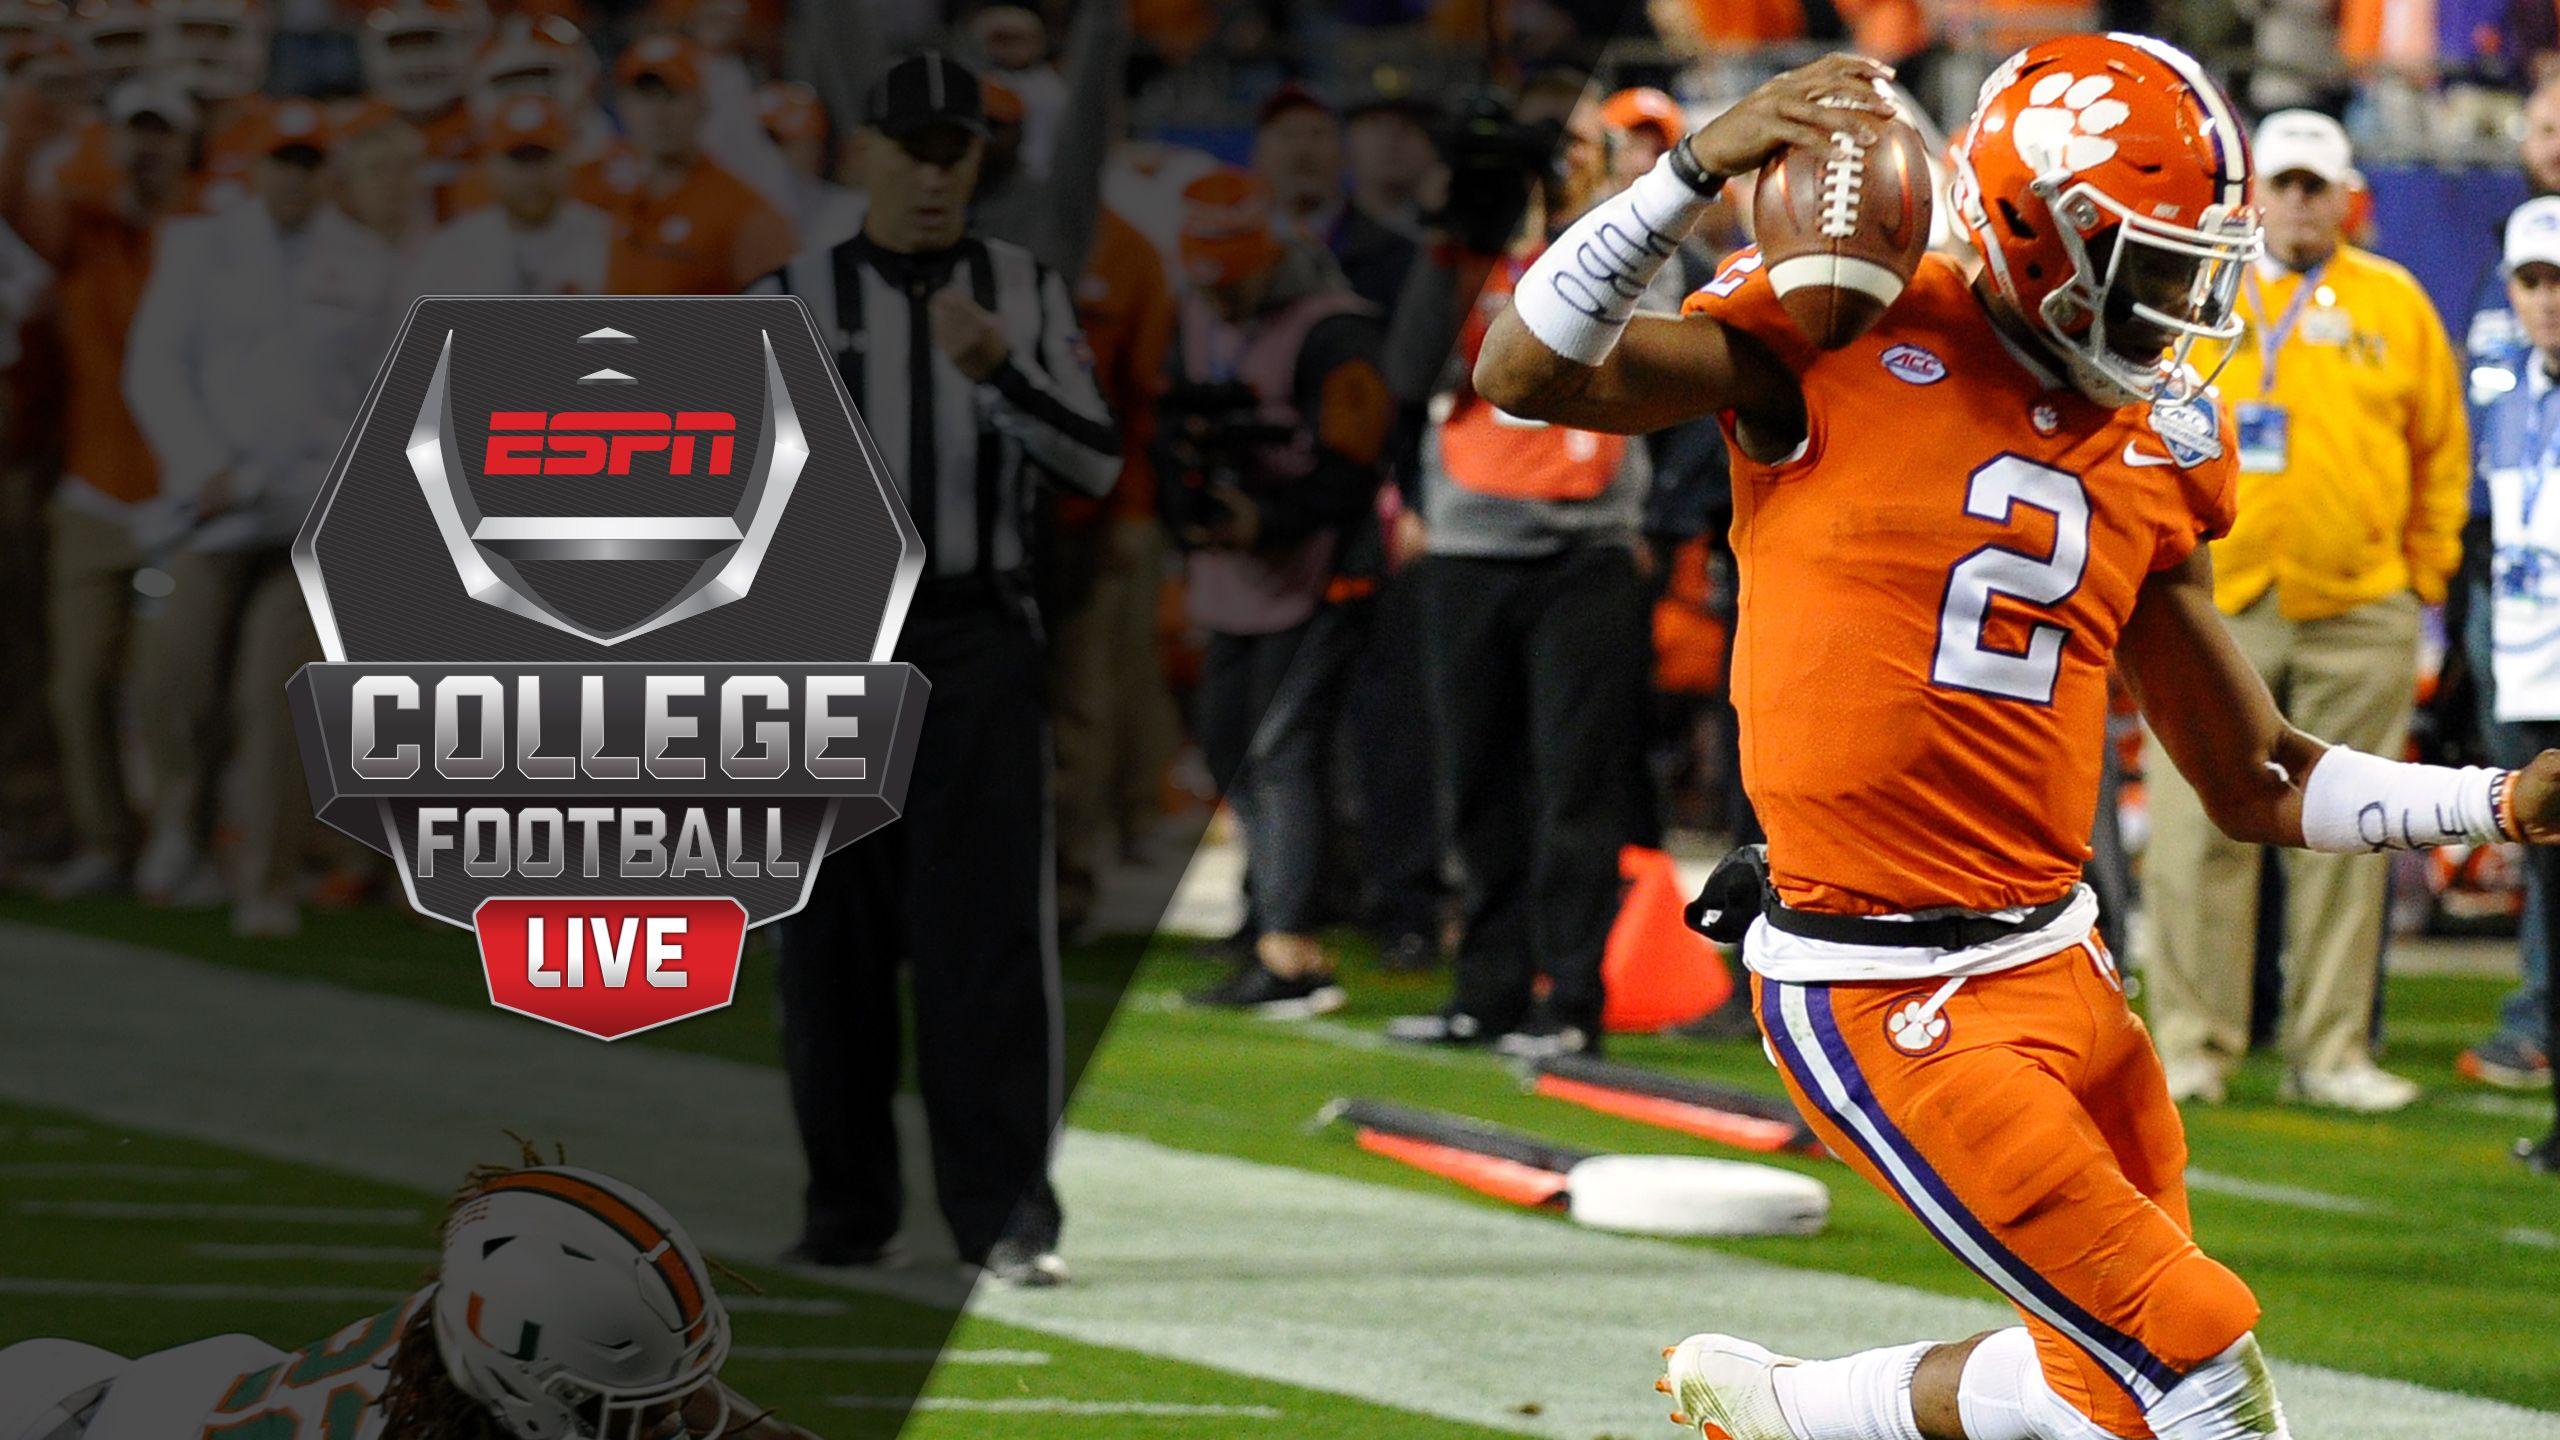 Fri, 12/15 - College Football Live